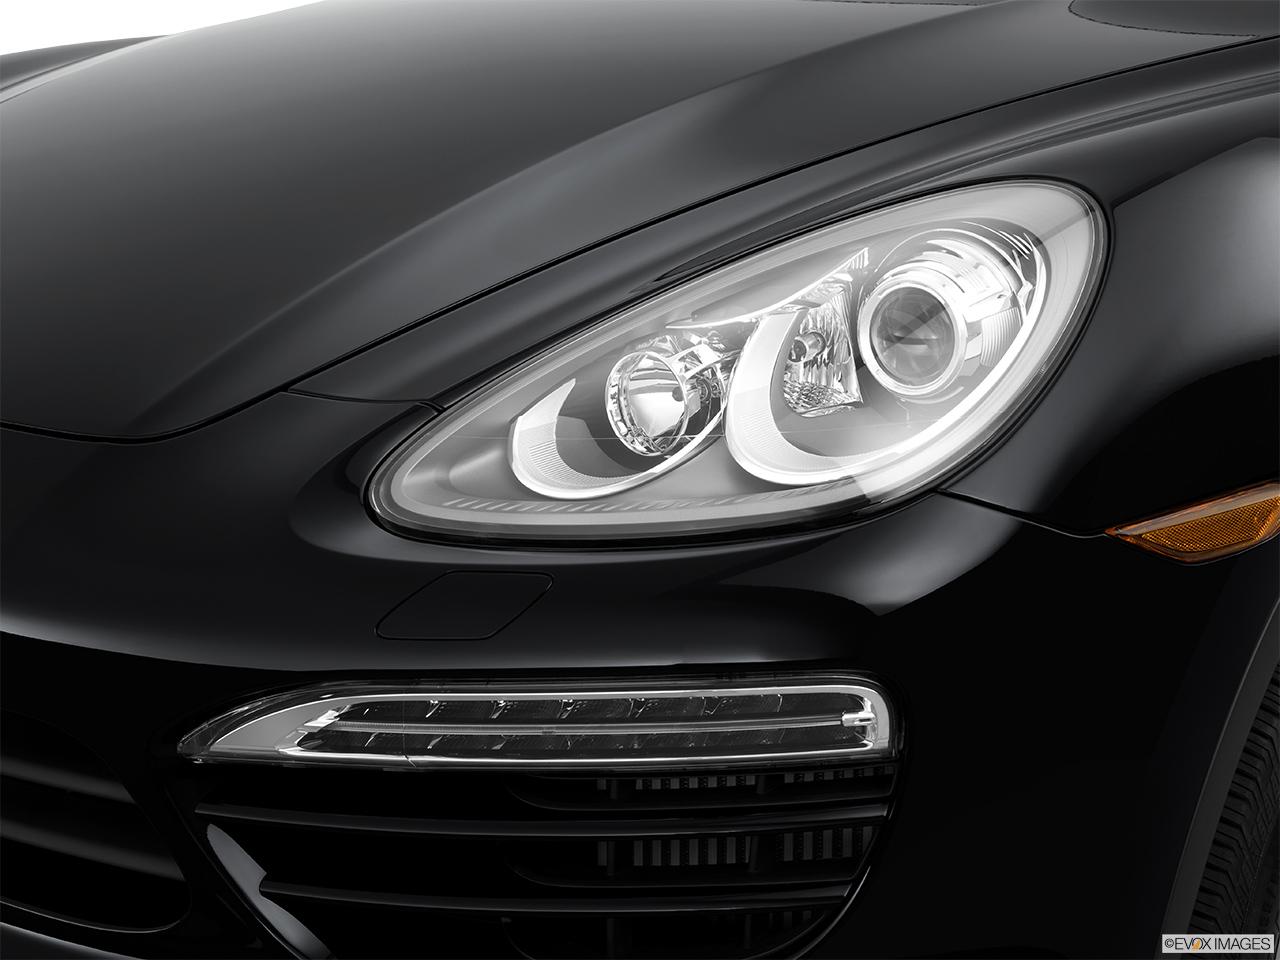 9489_st1280_043 jpg 2006 Porsche Cayenne Headlight Facelift 2015 Subaru STI  Headlights 2015 Jeep Cherokee Sport Headlights